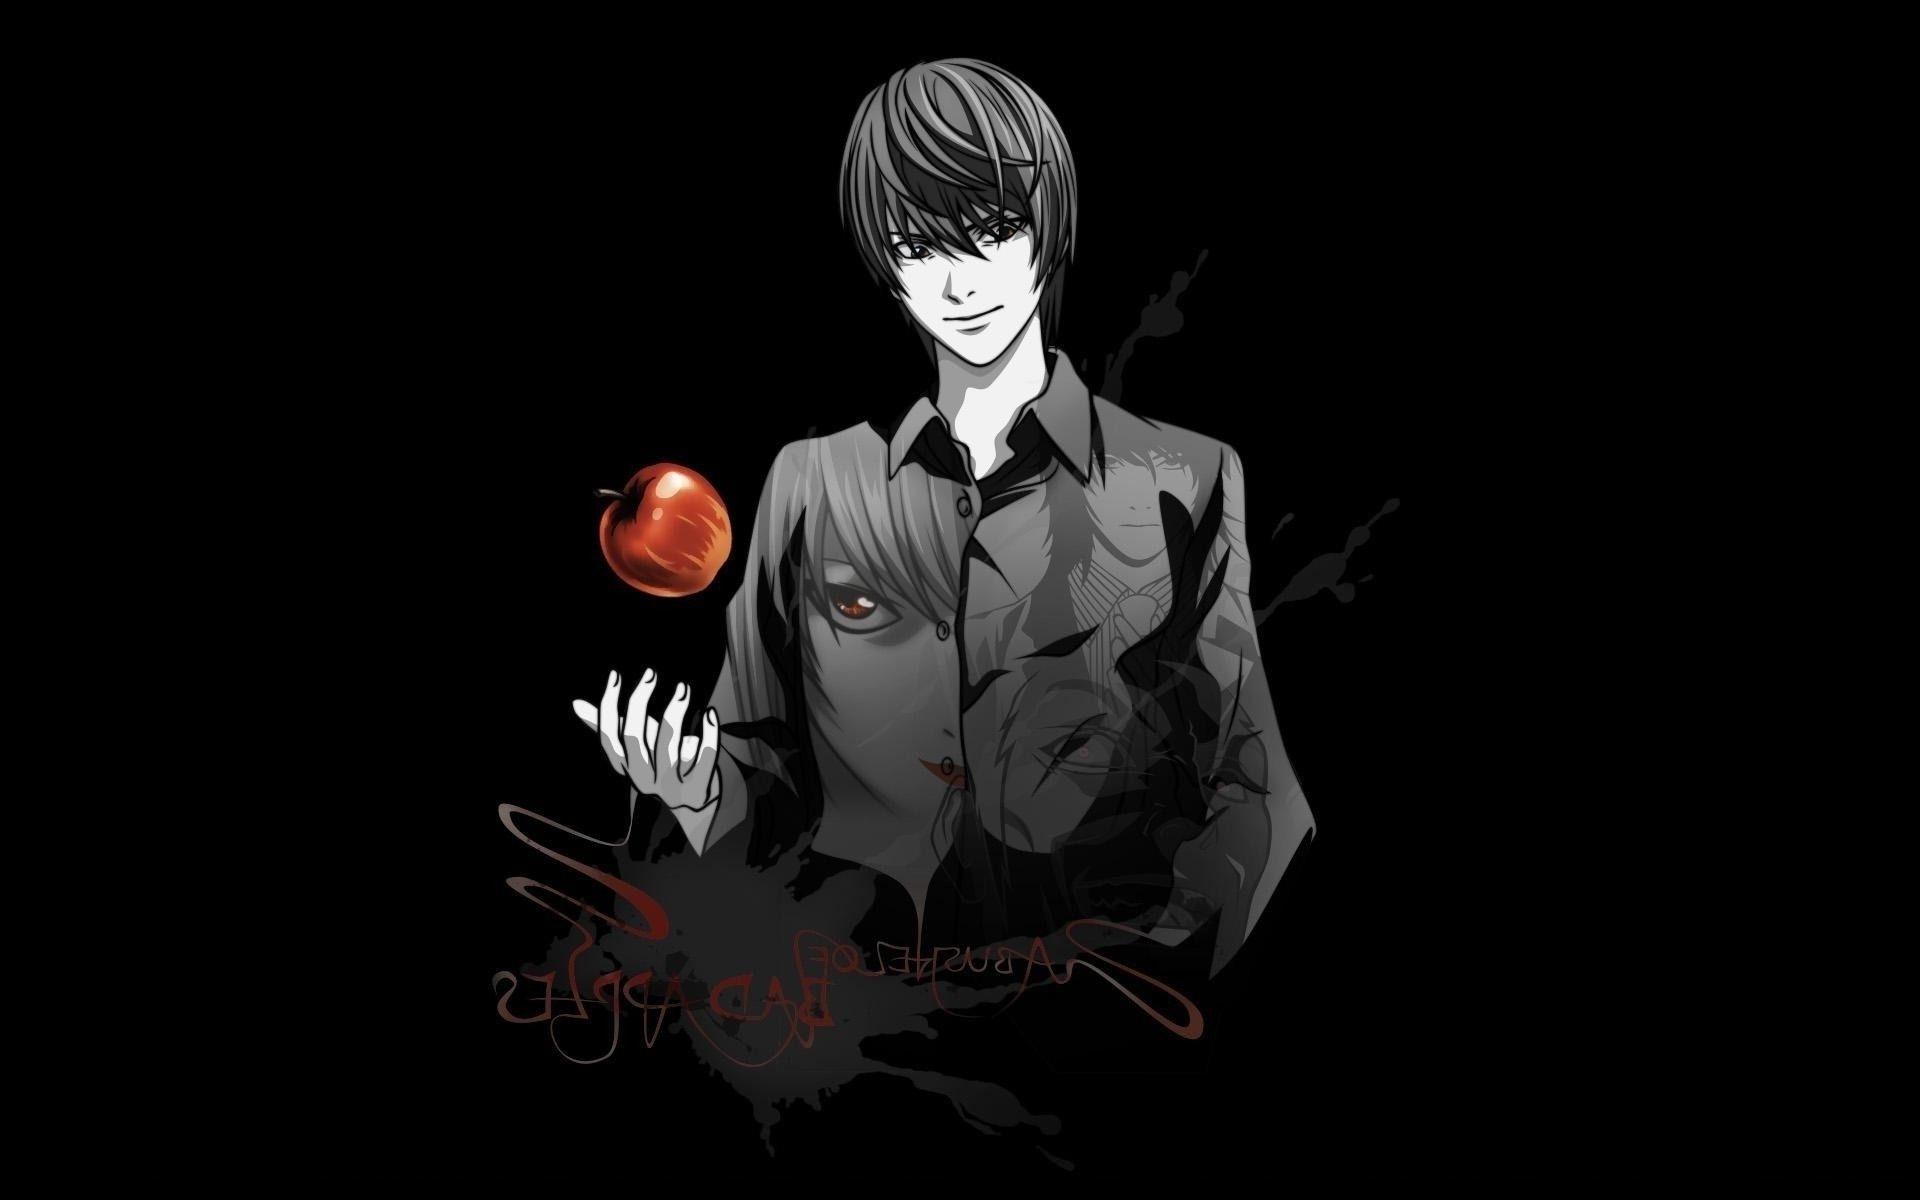 anime kira death note apple death note light kira,. android